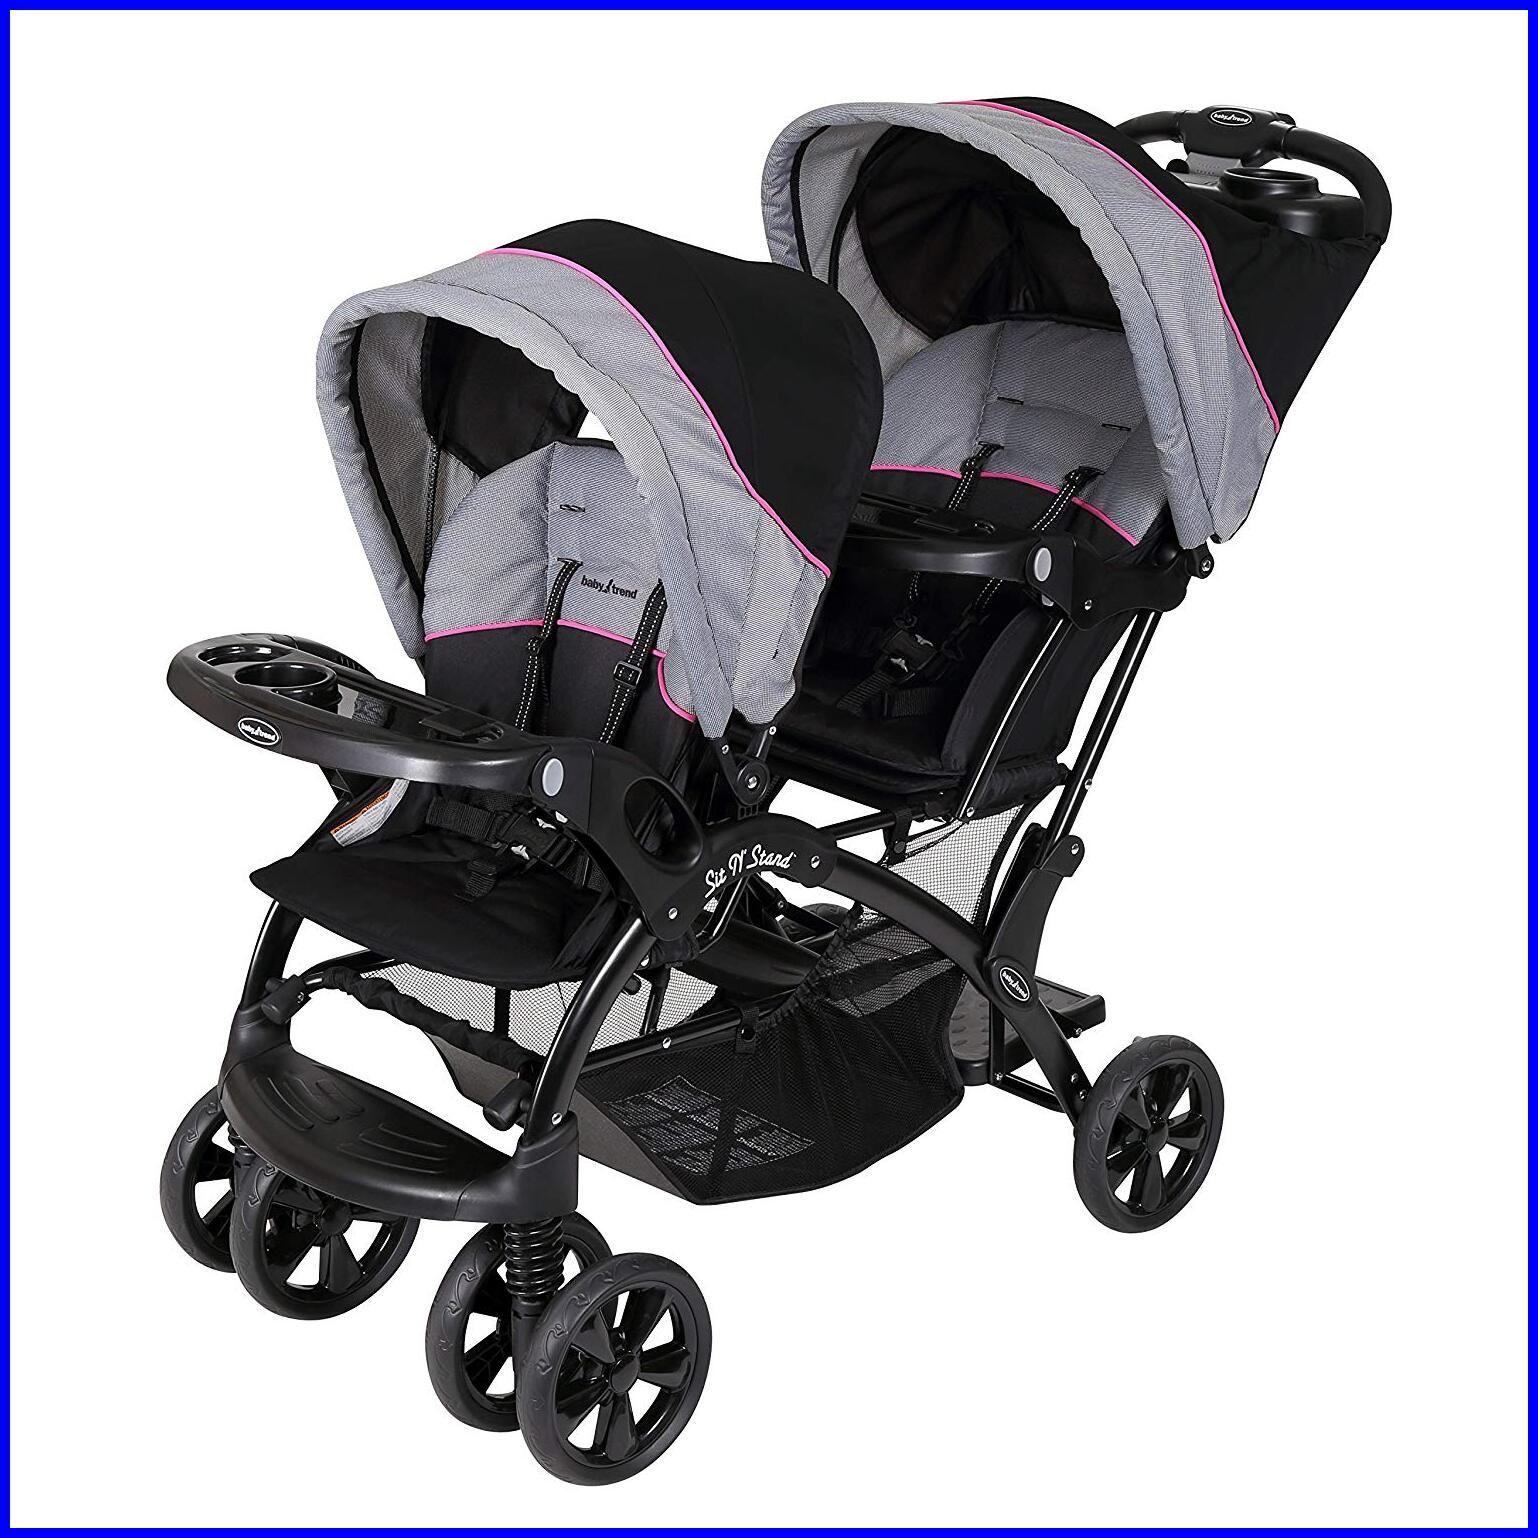 Baby Trend Sit N Stand Ultra Stroller Granite Baby Trend Baby Trend Double Stroller Baby Trend Stroller